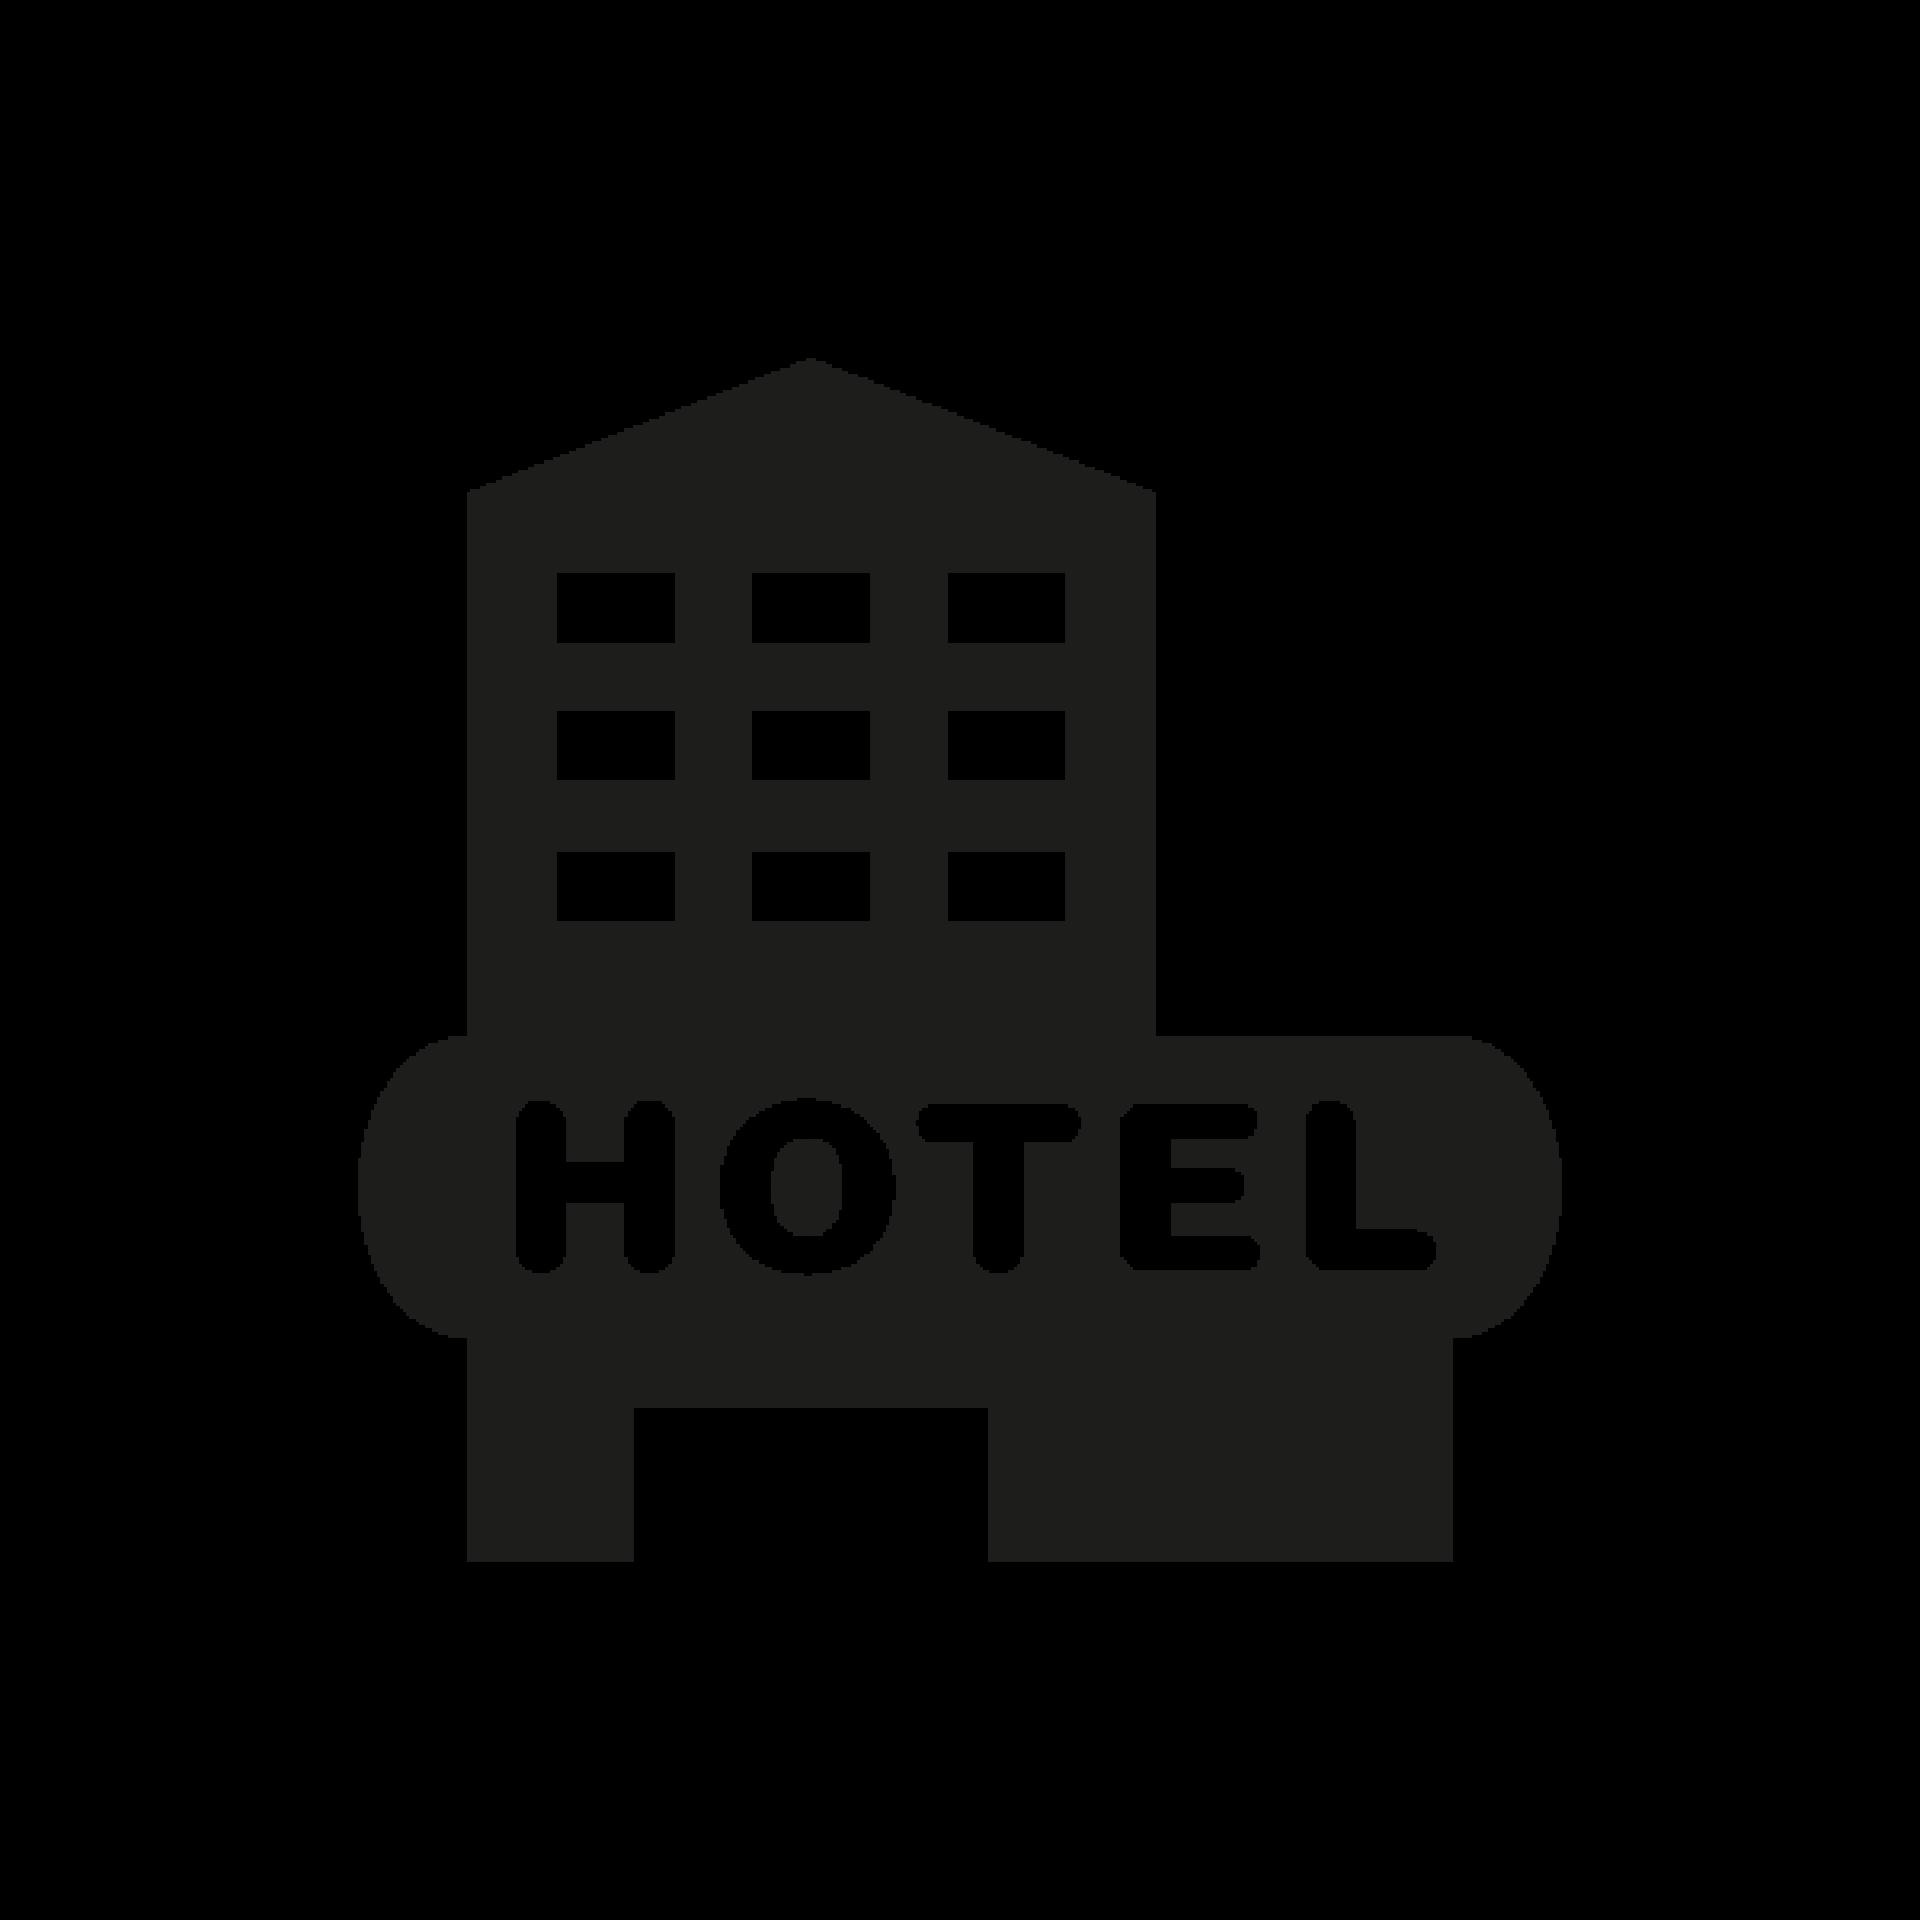 Icone Hotels